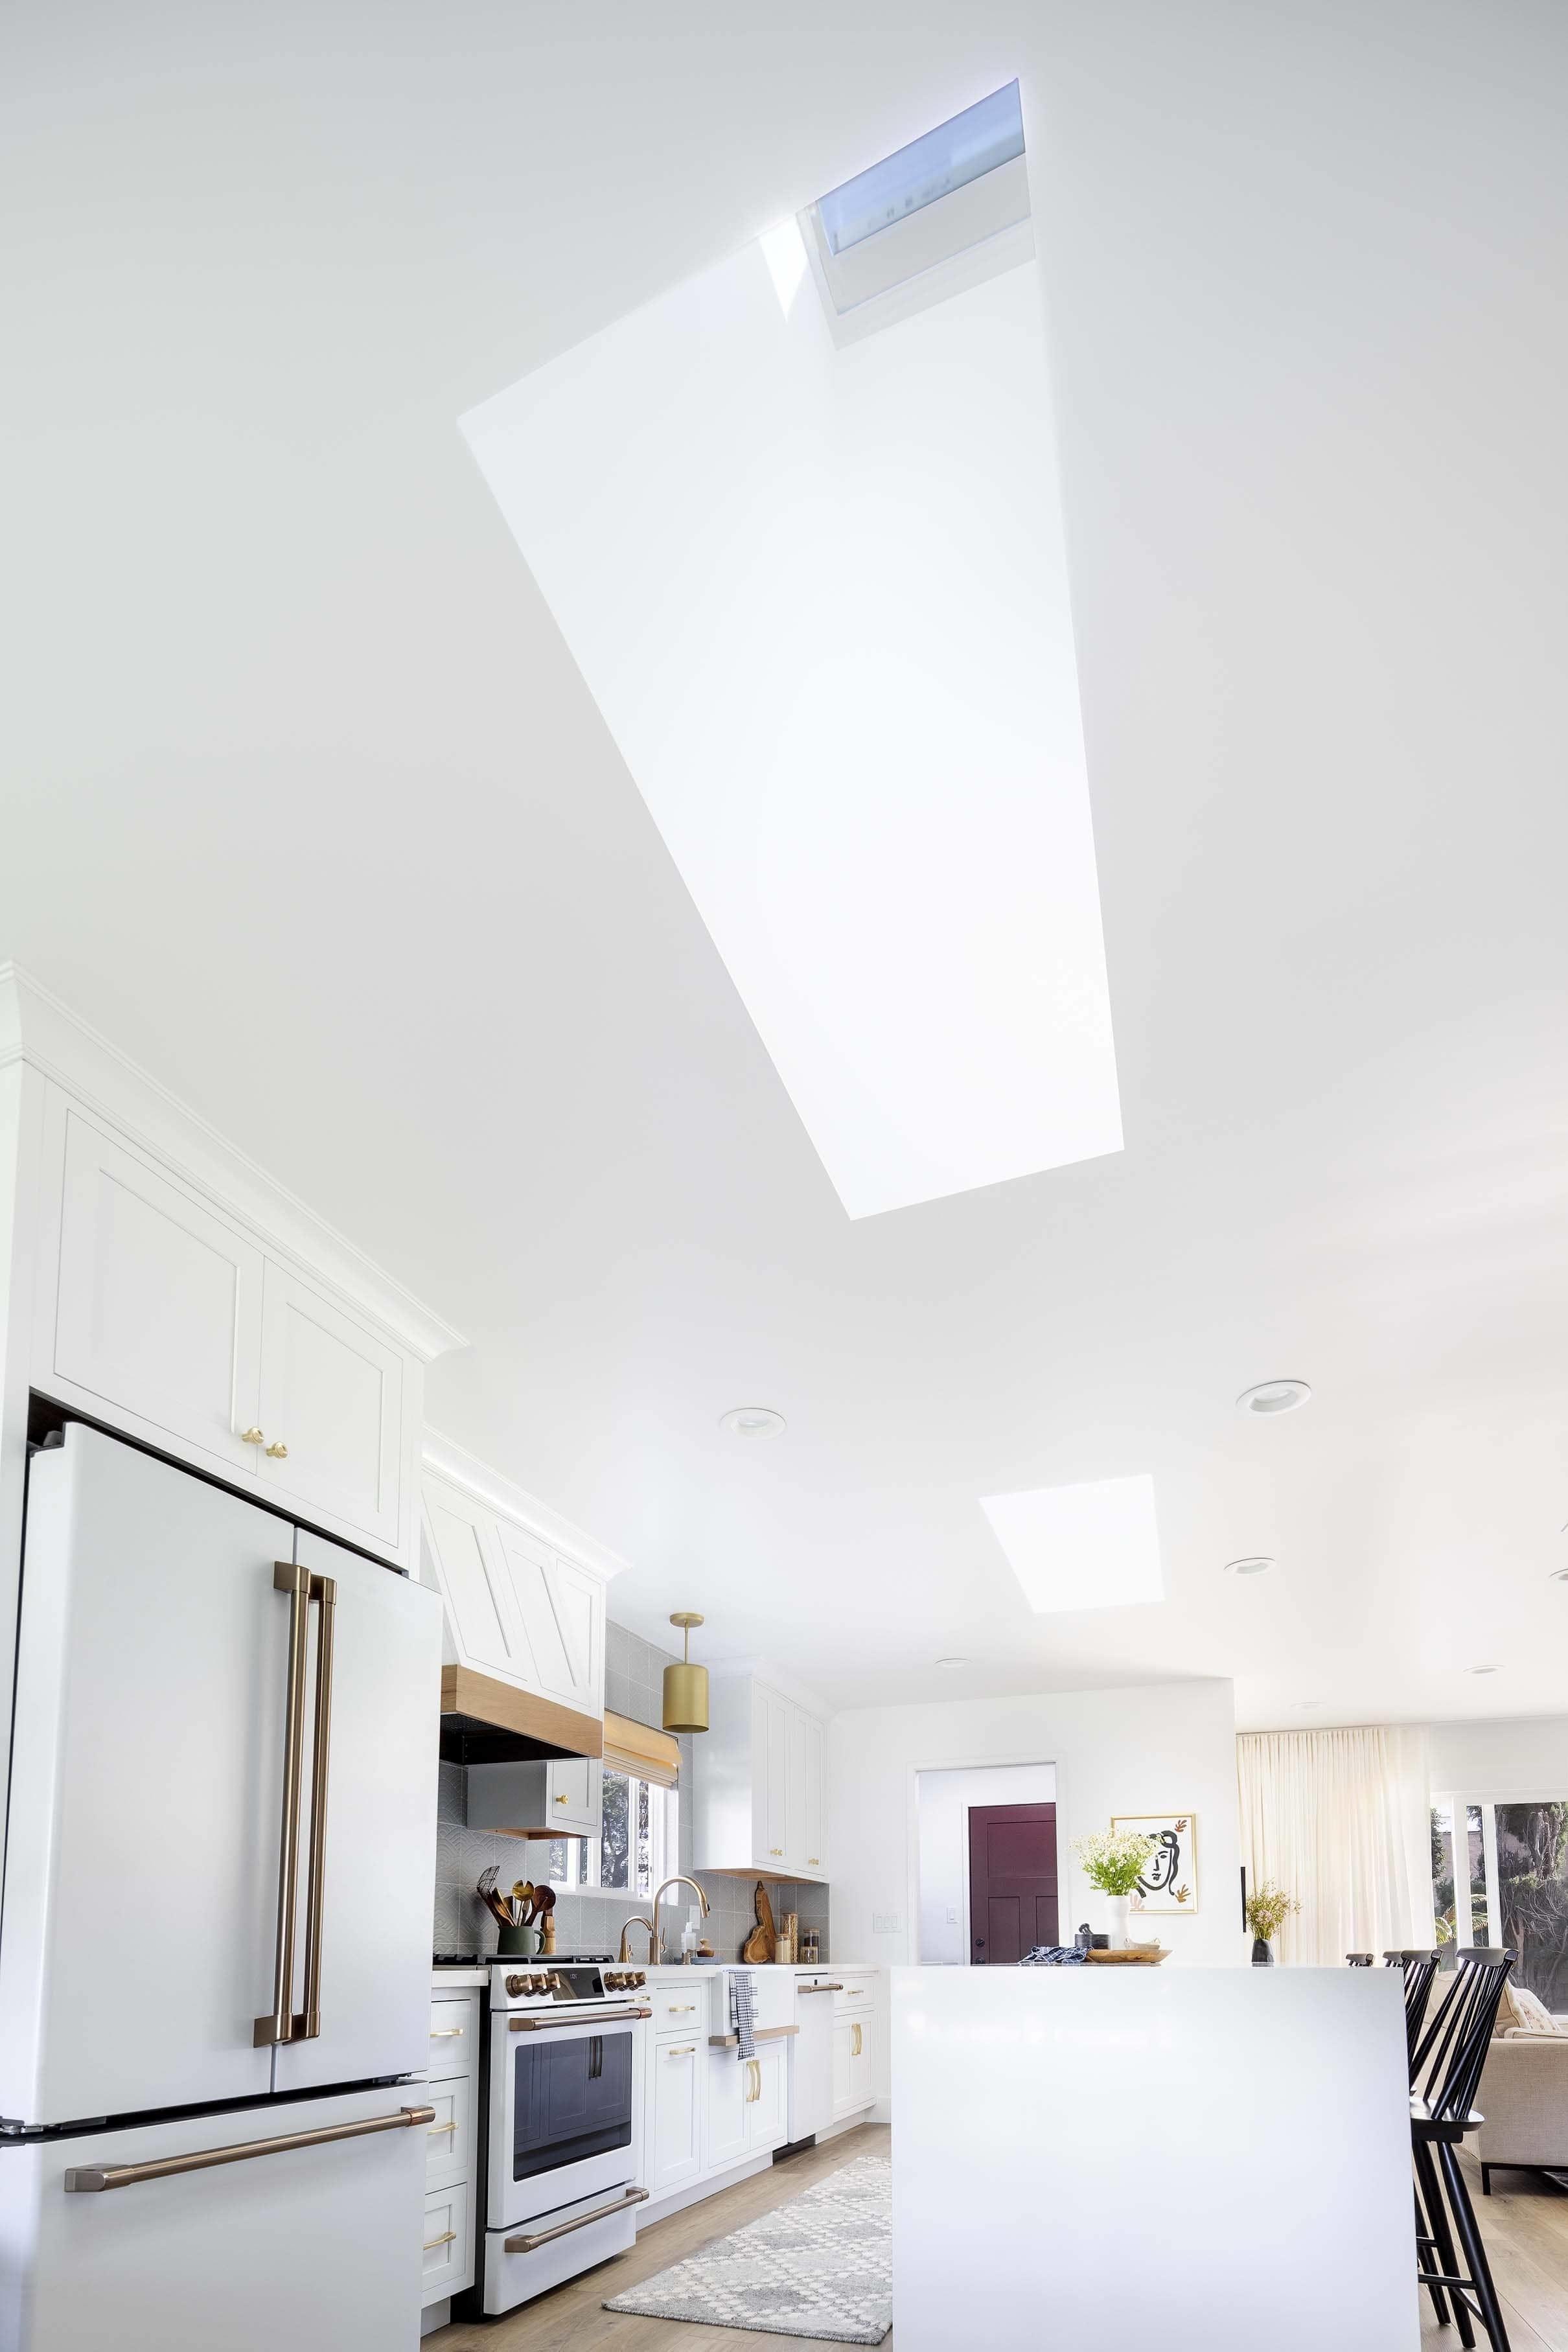 Skylight in white kitchen